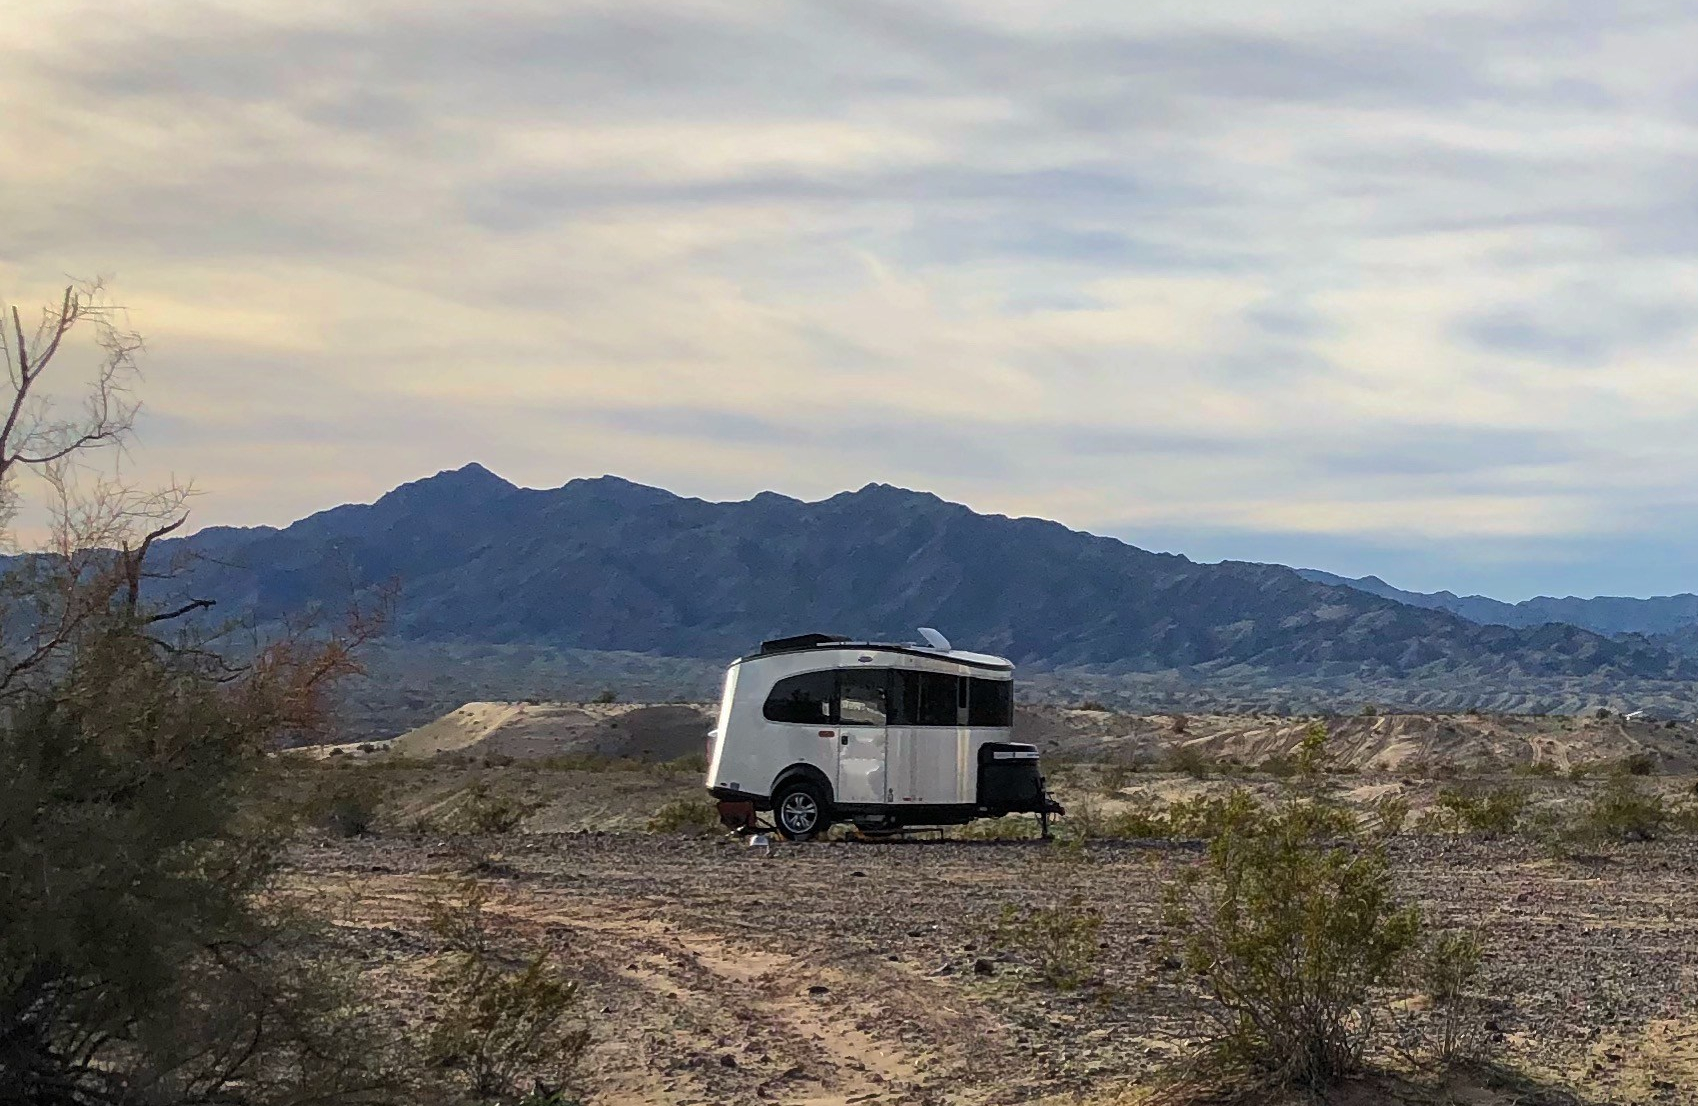 Airstream Basecamp Repairs & Warranty Work – Tails of Wanderlust